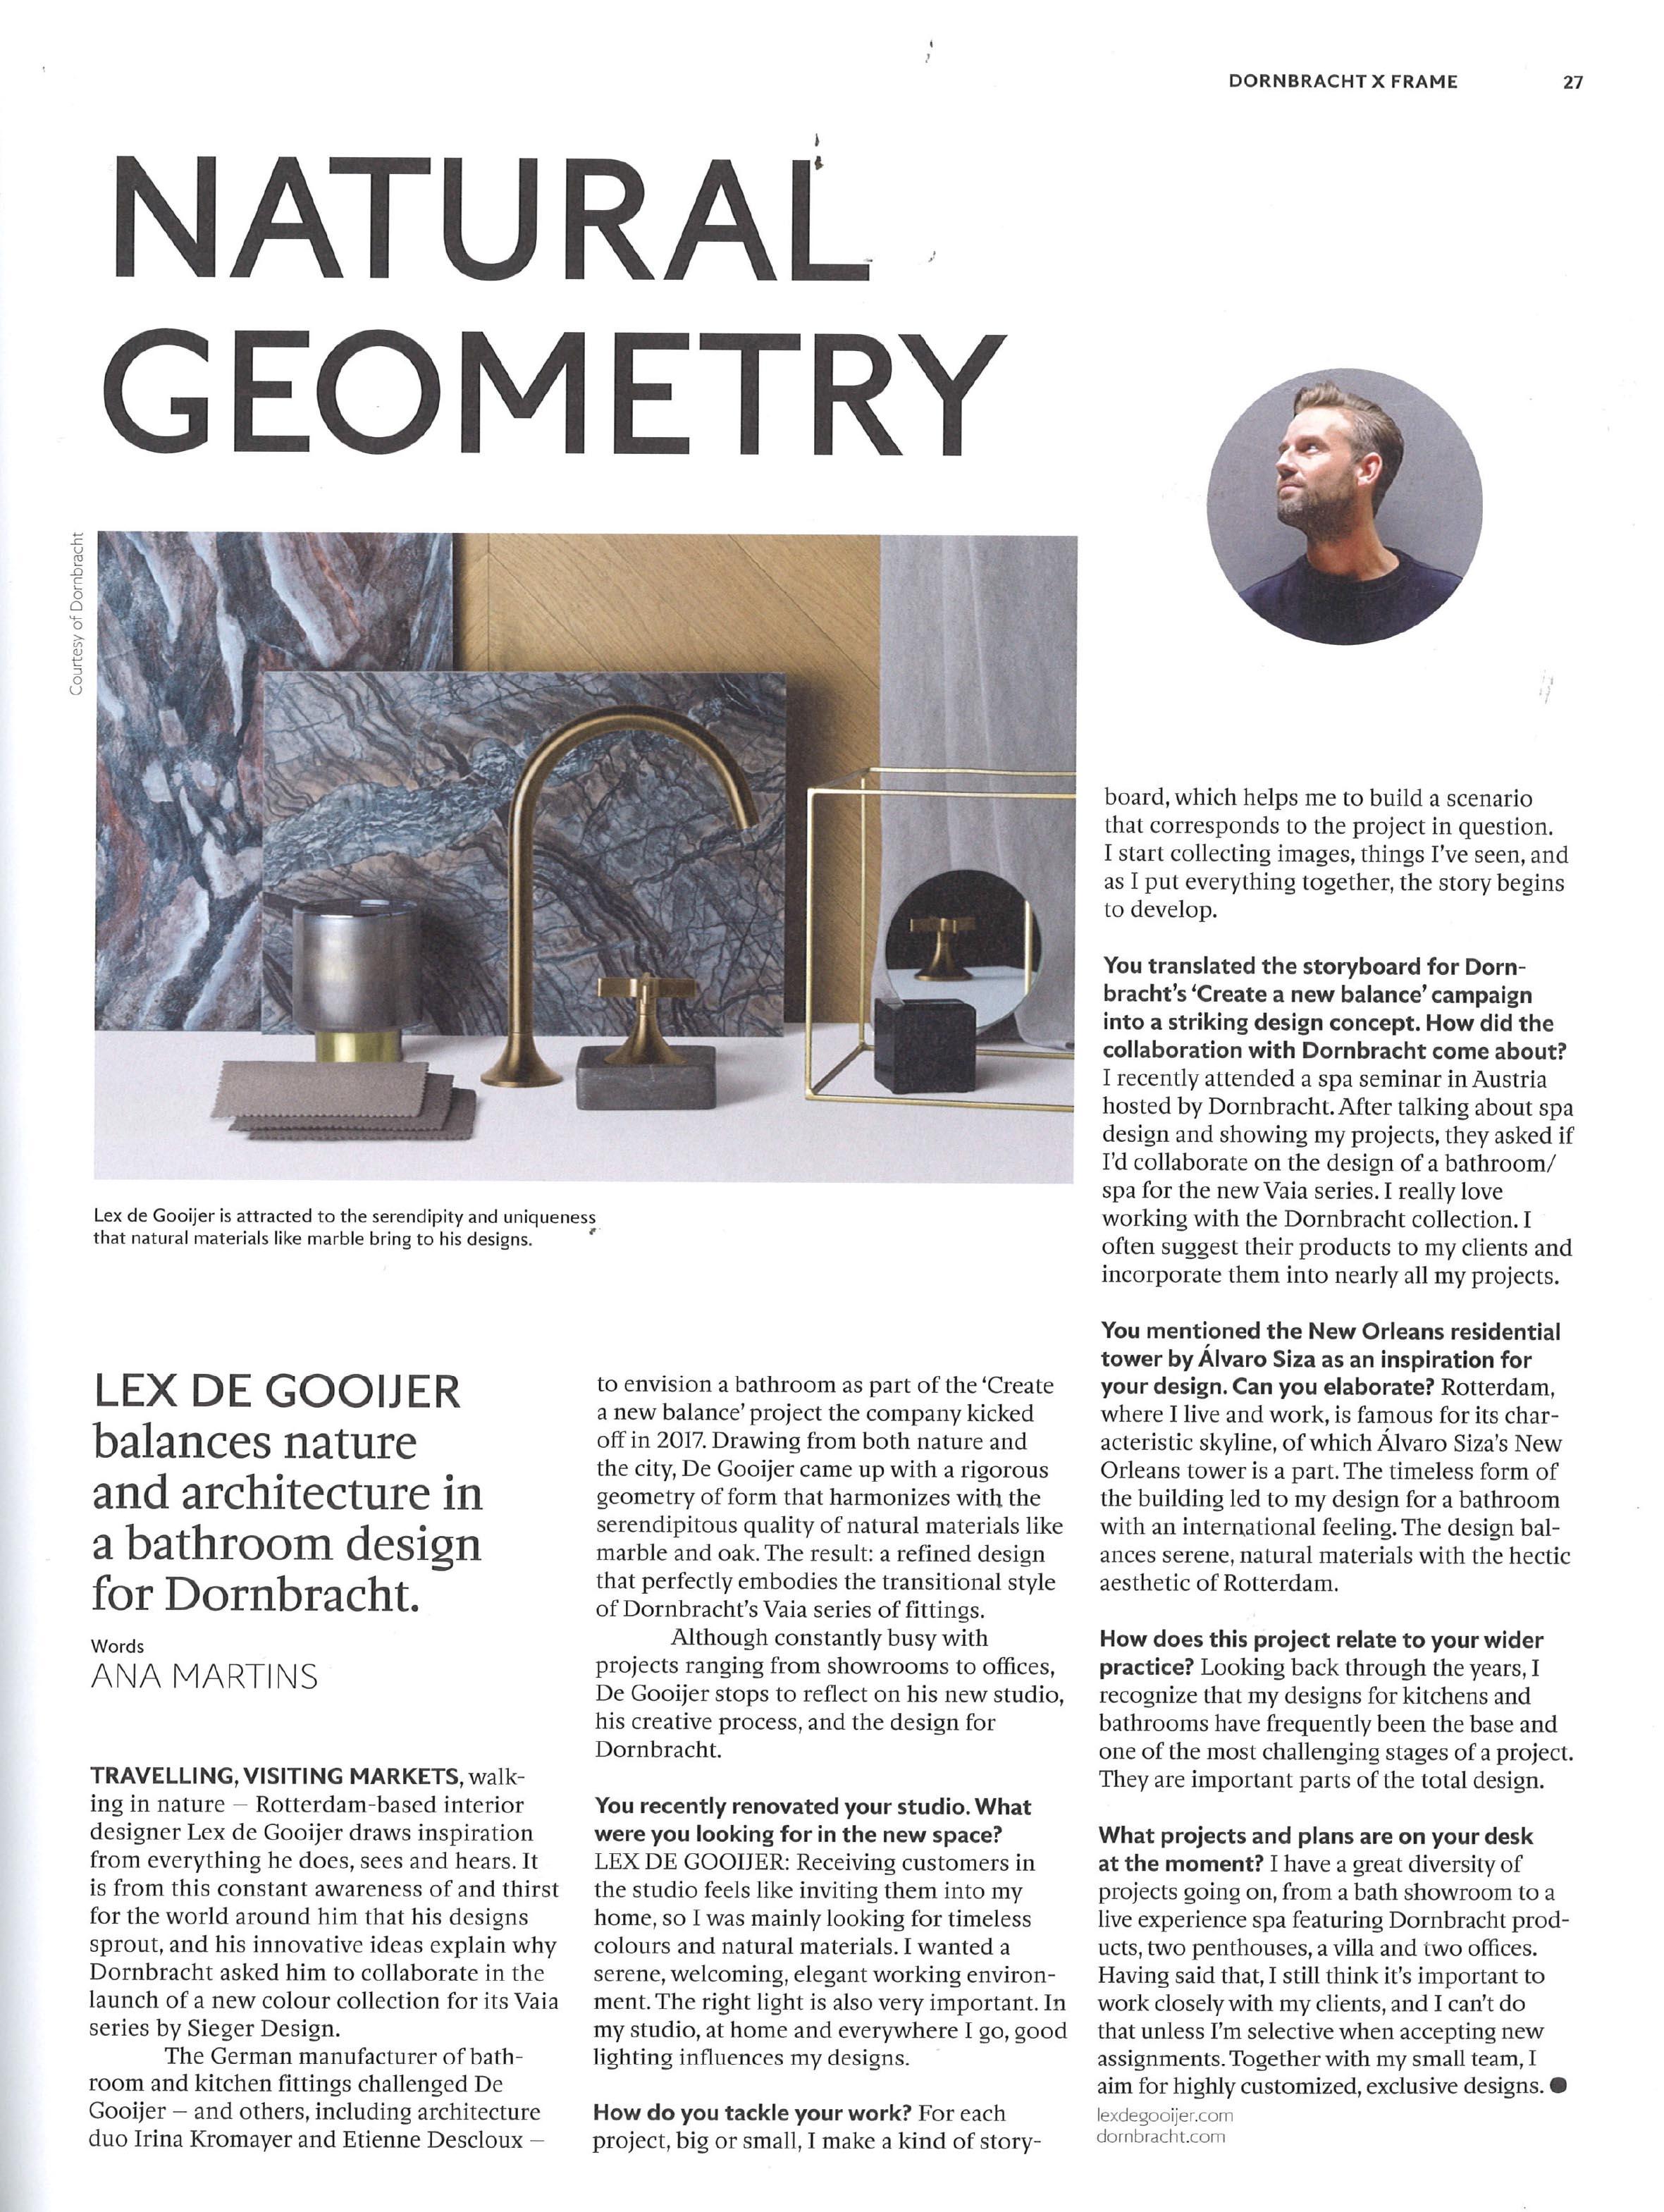 003 Frame magazine 2018 Lex de gooijer Interiors dornbracht .jpg